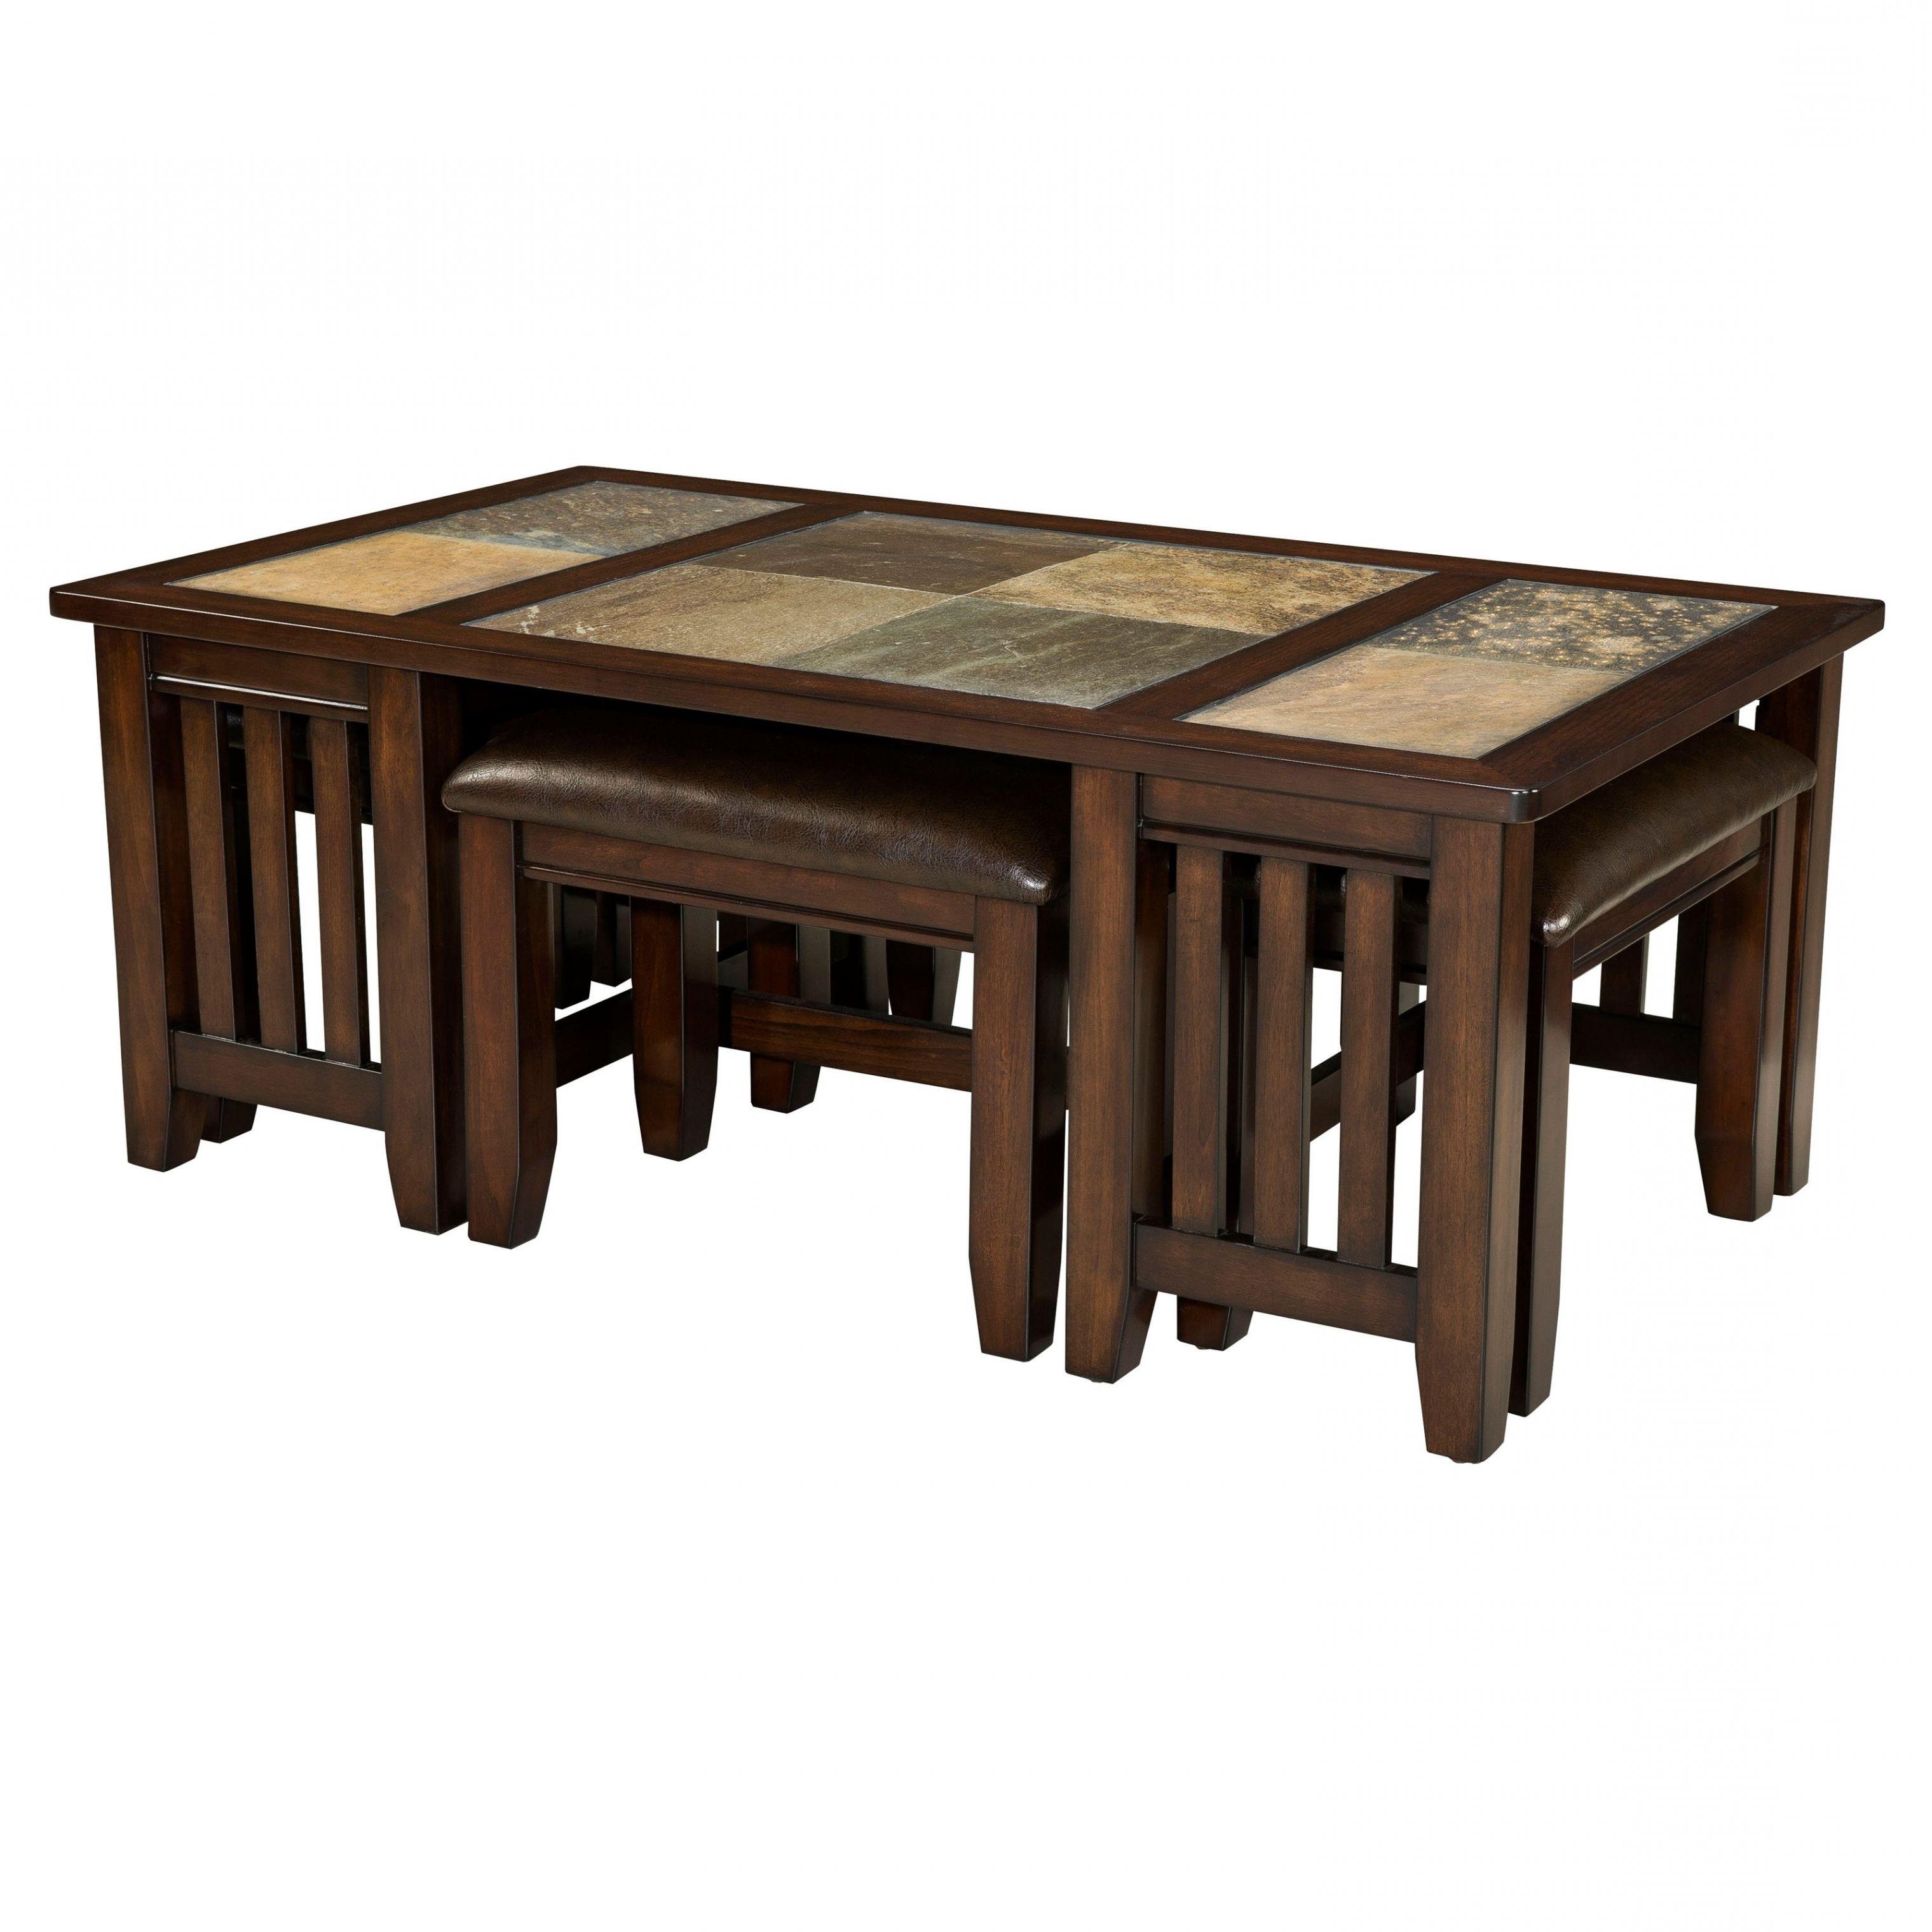 70 Marvelous Modern Coffee Table Design Inspirations Collections Freshouz Com Coffee Table Design Modern Distressed Coffee Table Coffee Table With Stools [ 3040 x 3040 Pixel ]